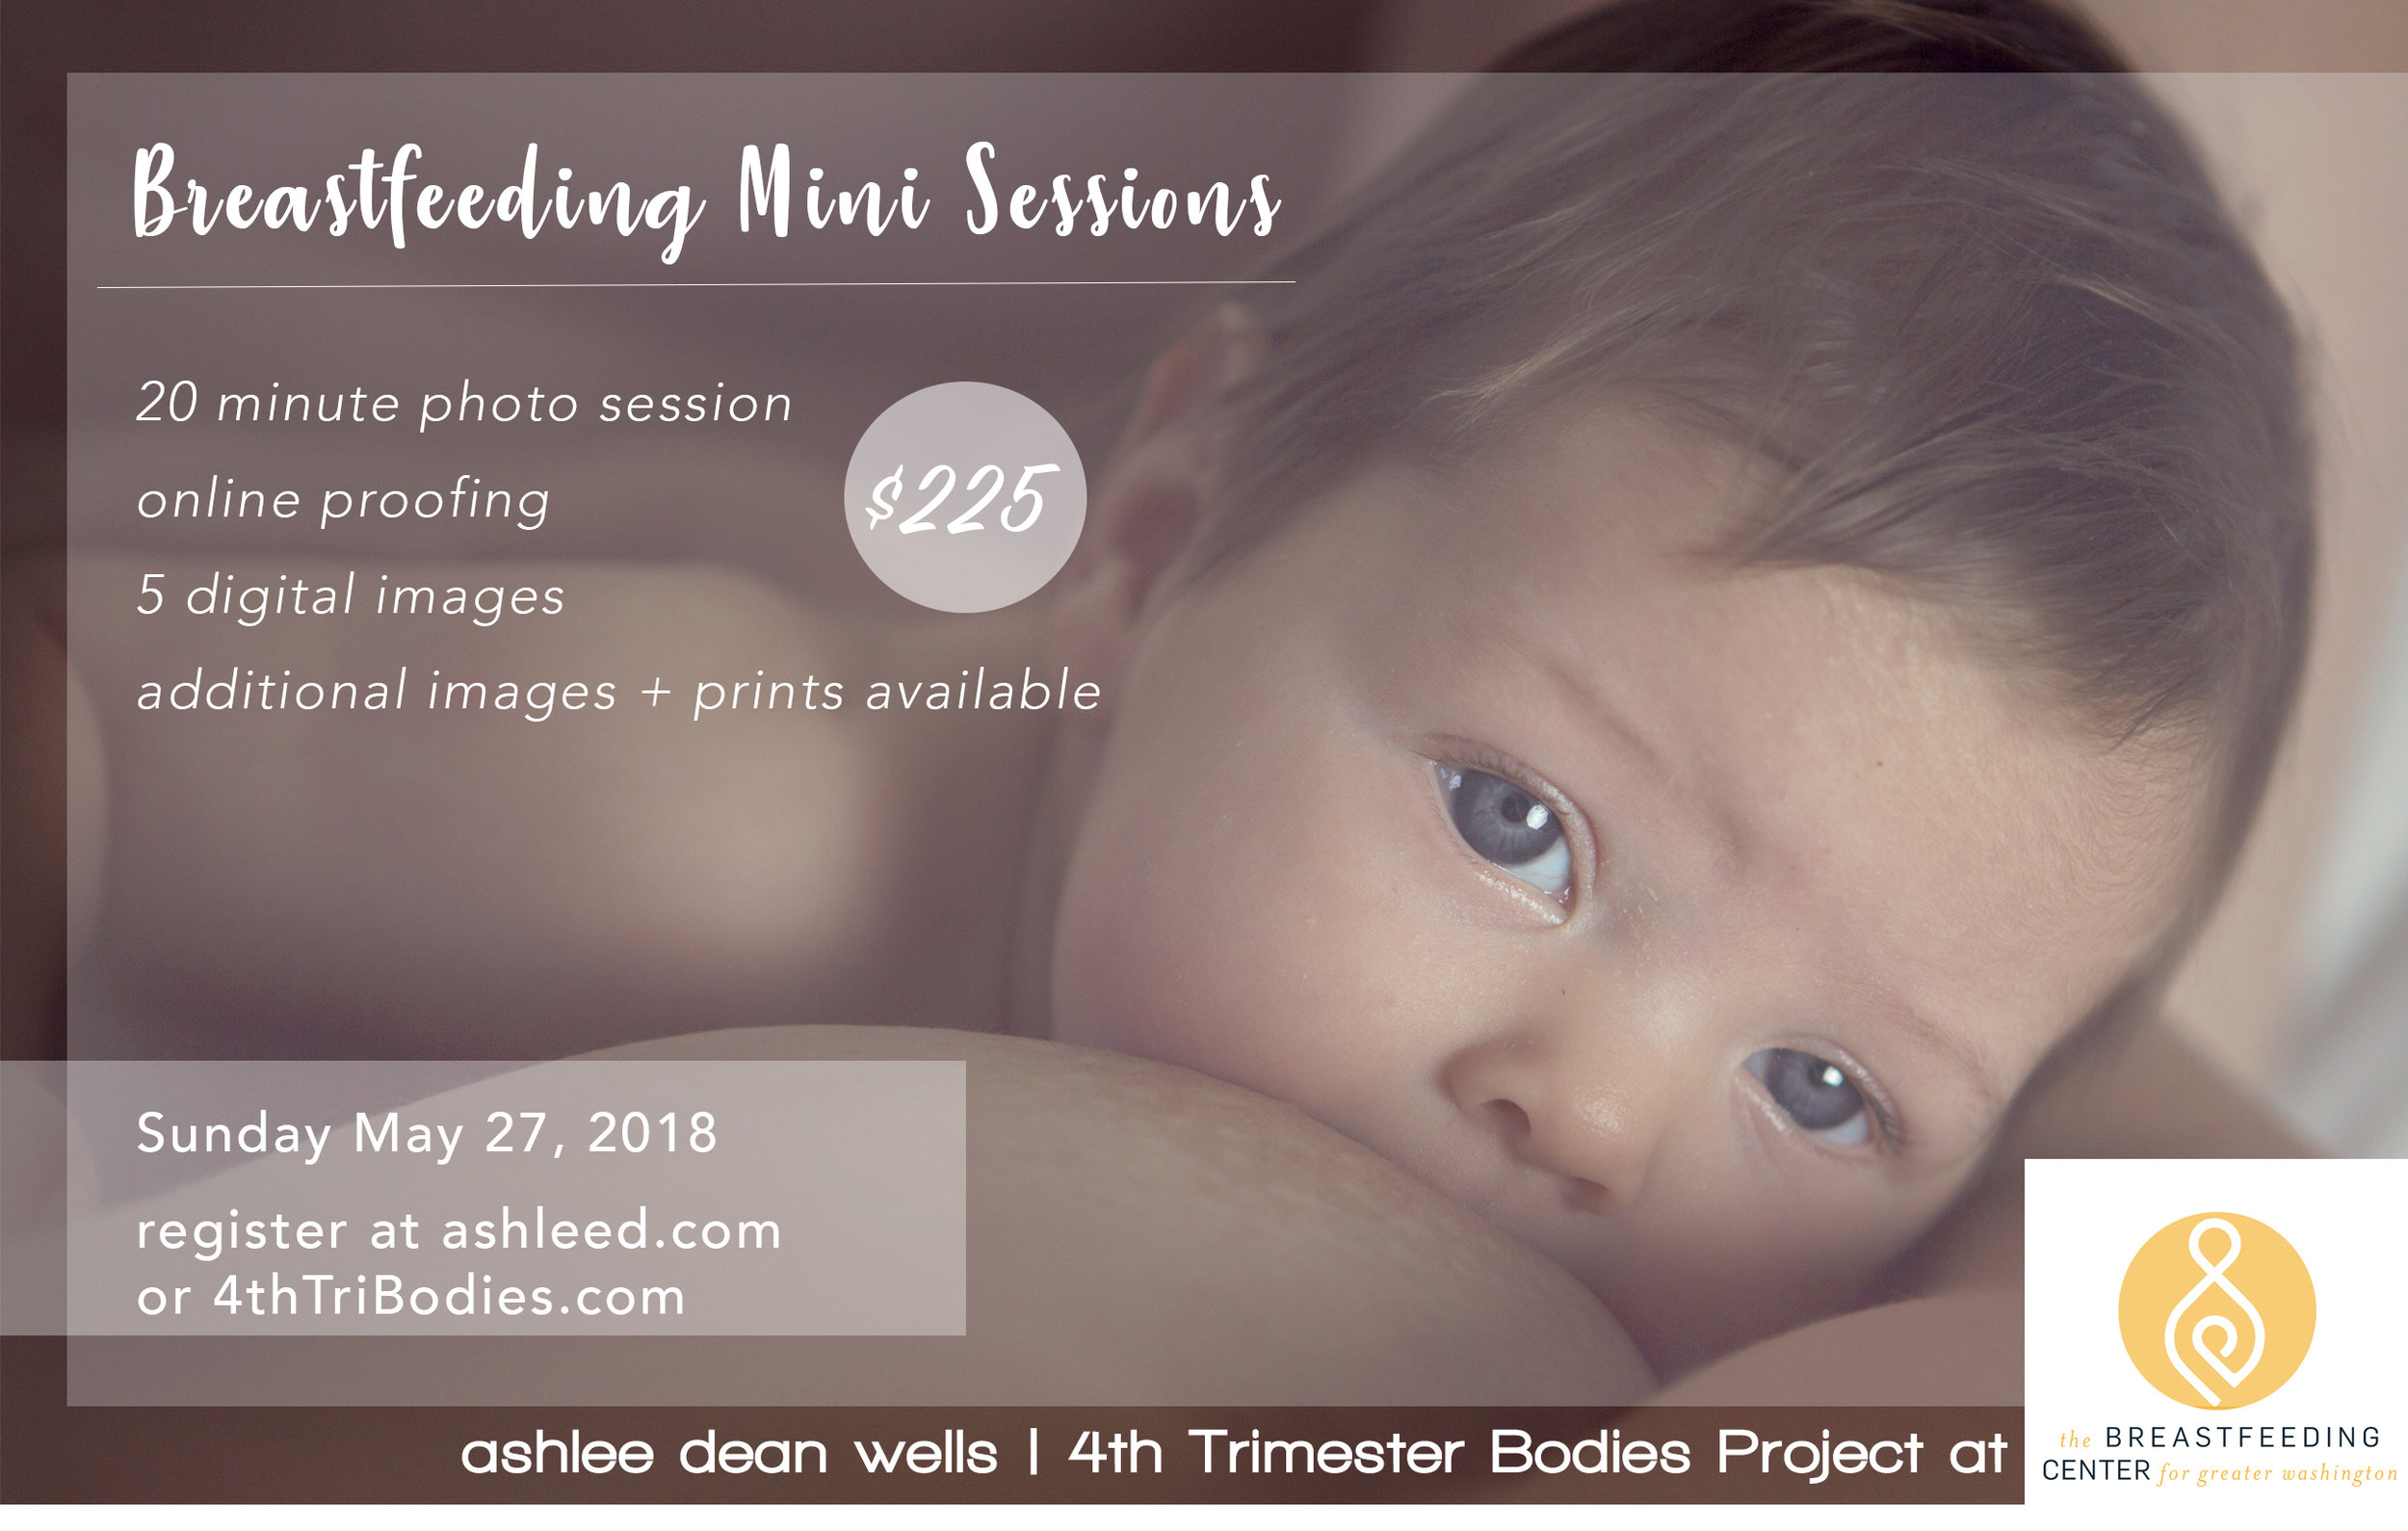 breastfeeding mini crop dc.jpg